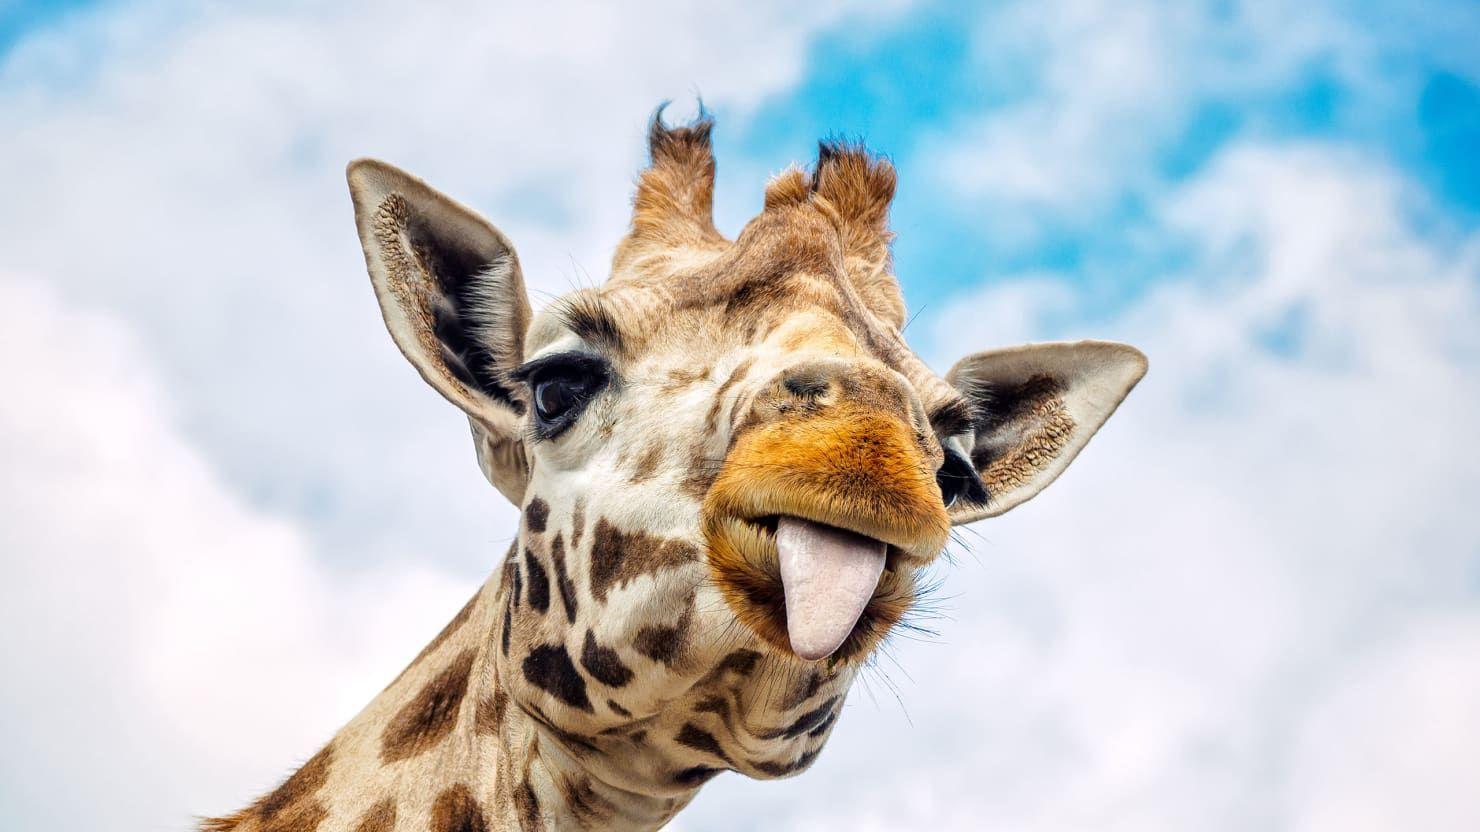 Giraffe Giraffe, Animals, Giraffe pictures